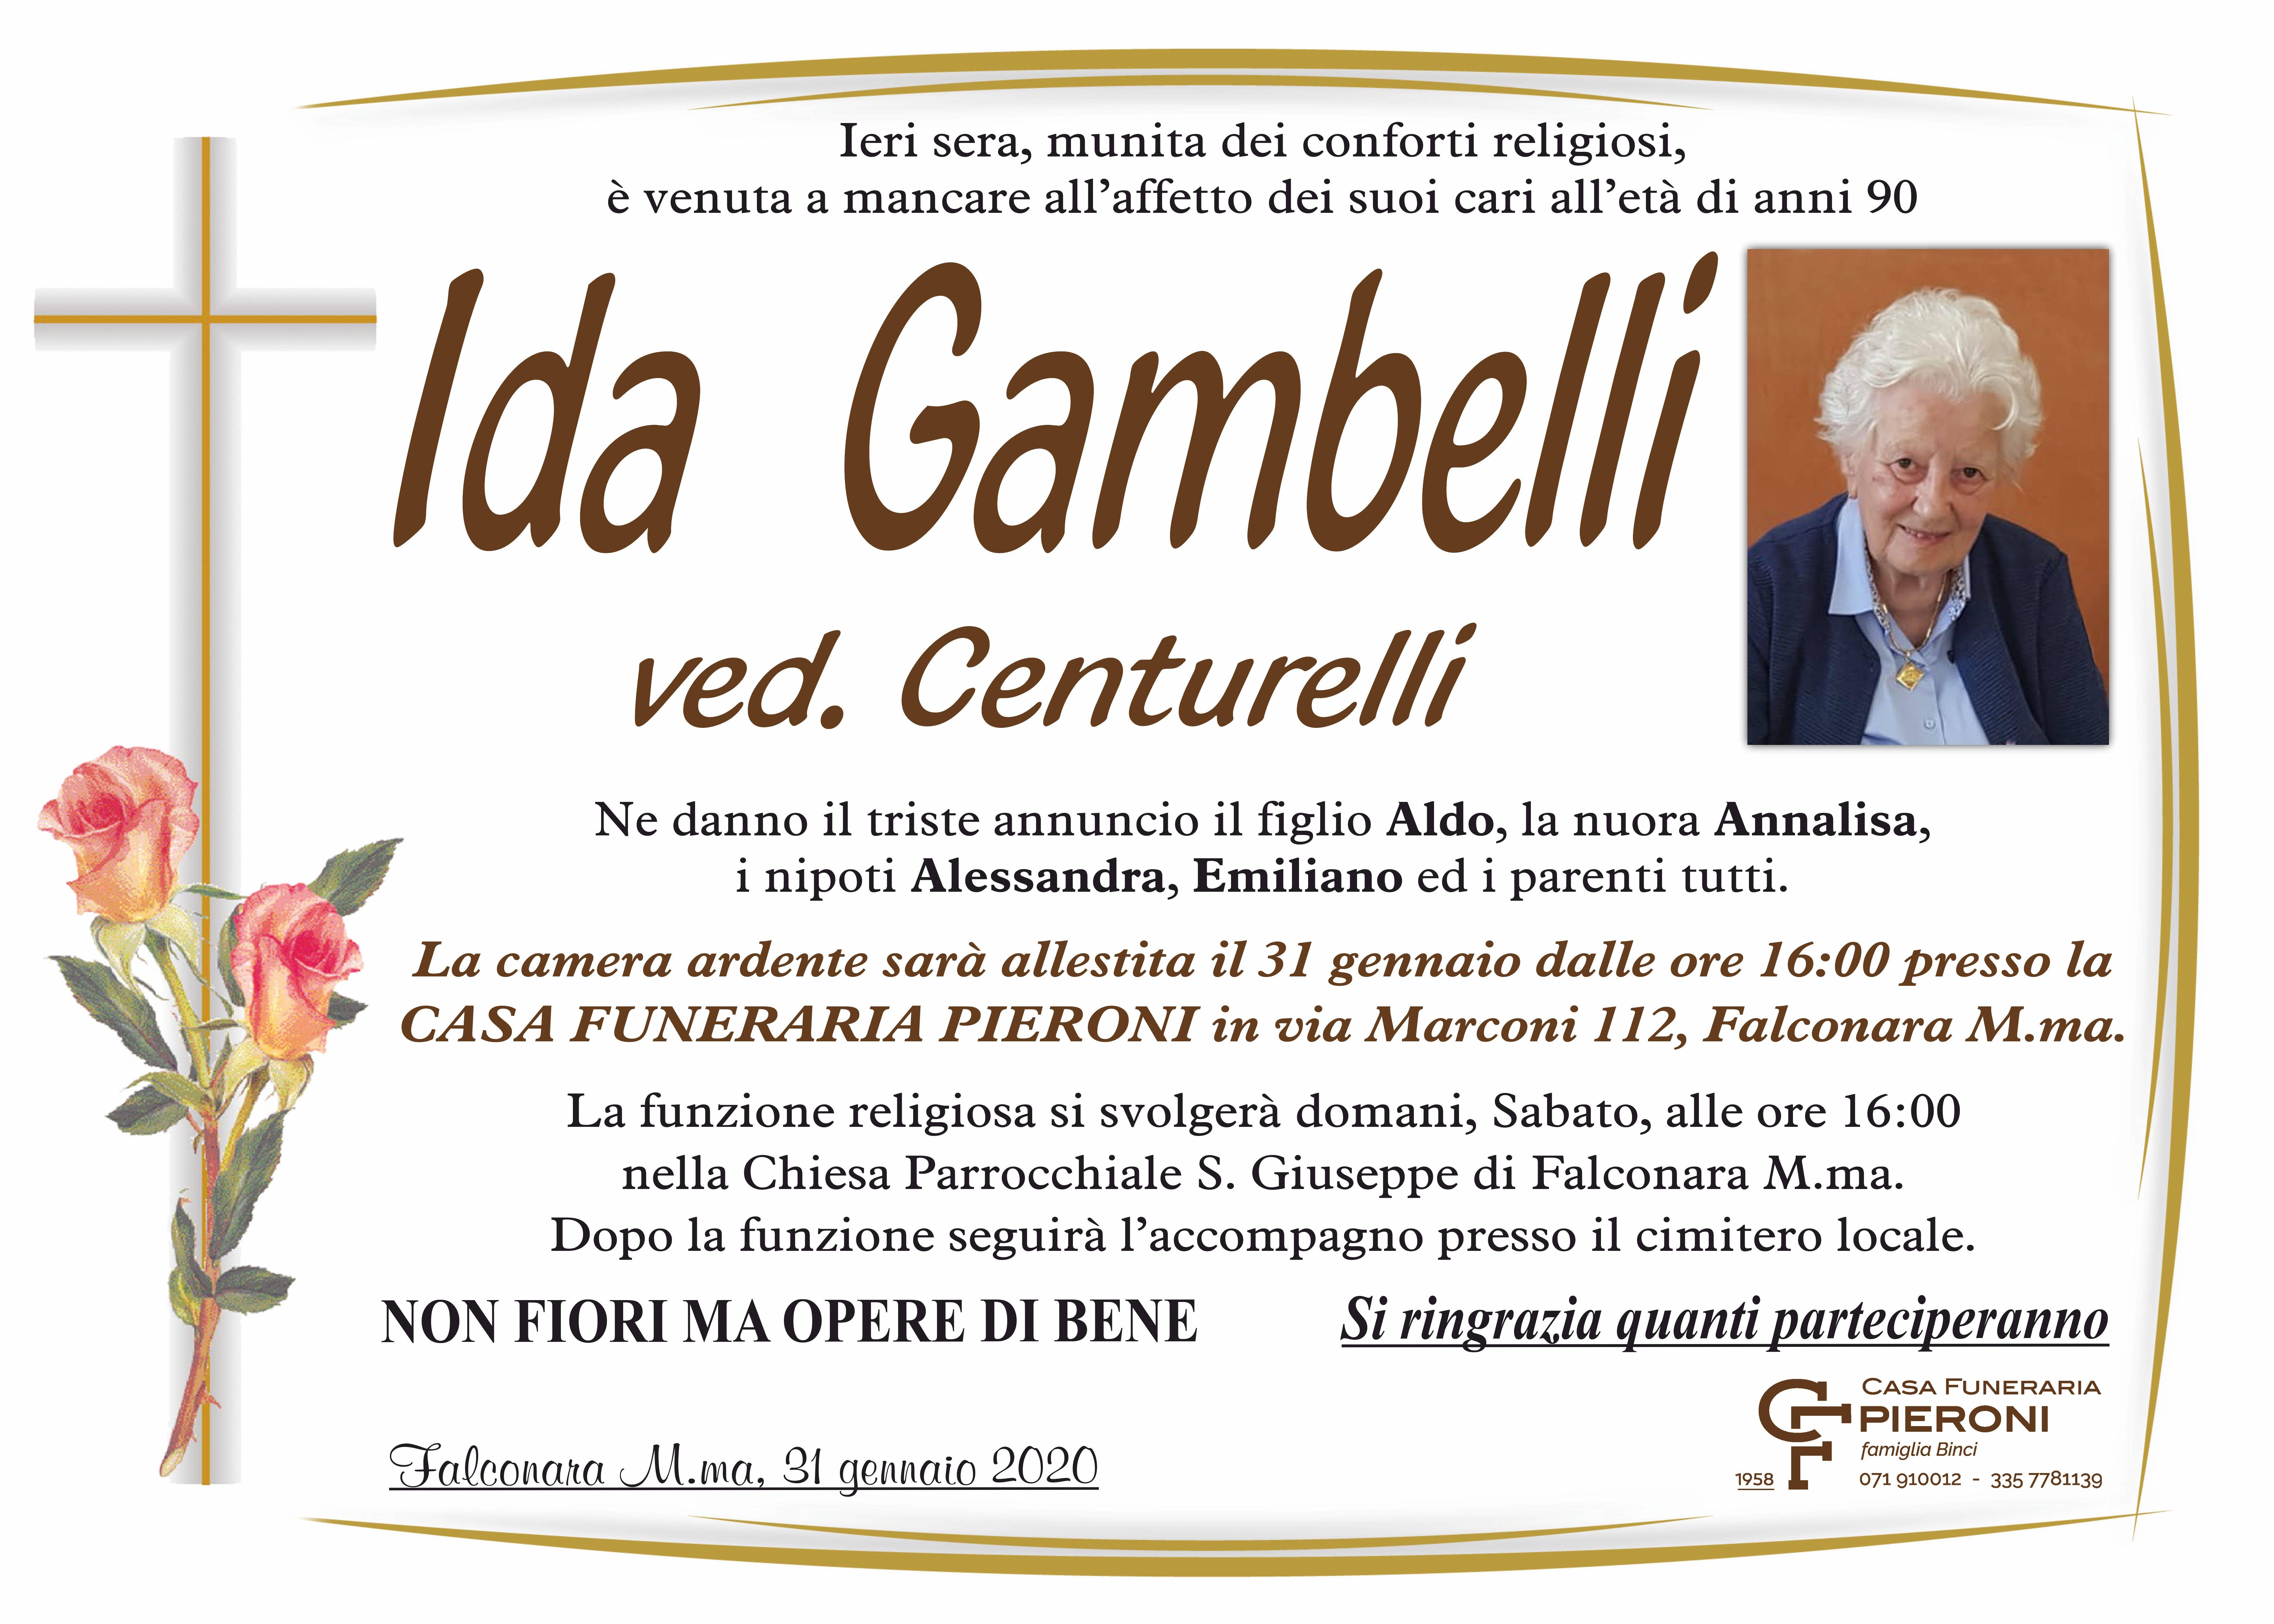 Ida Gambelli